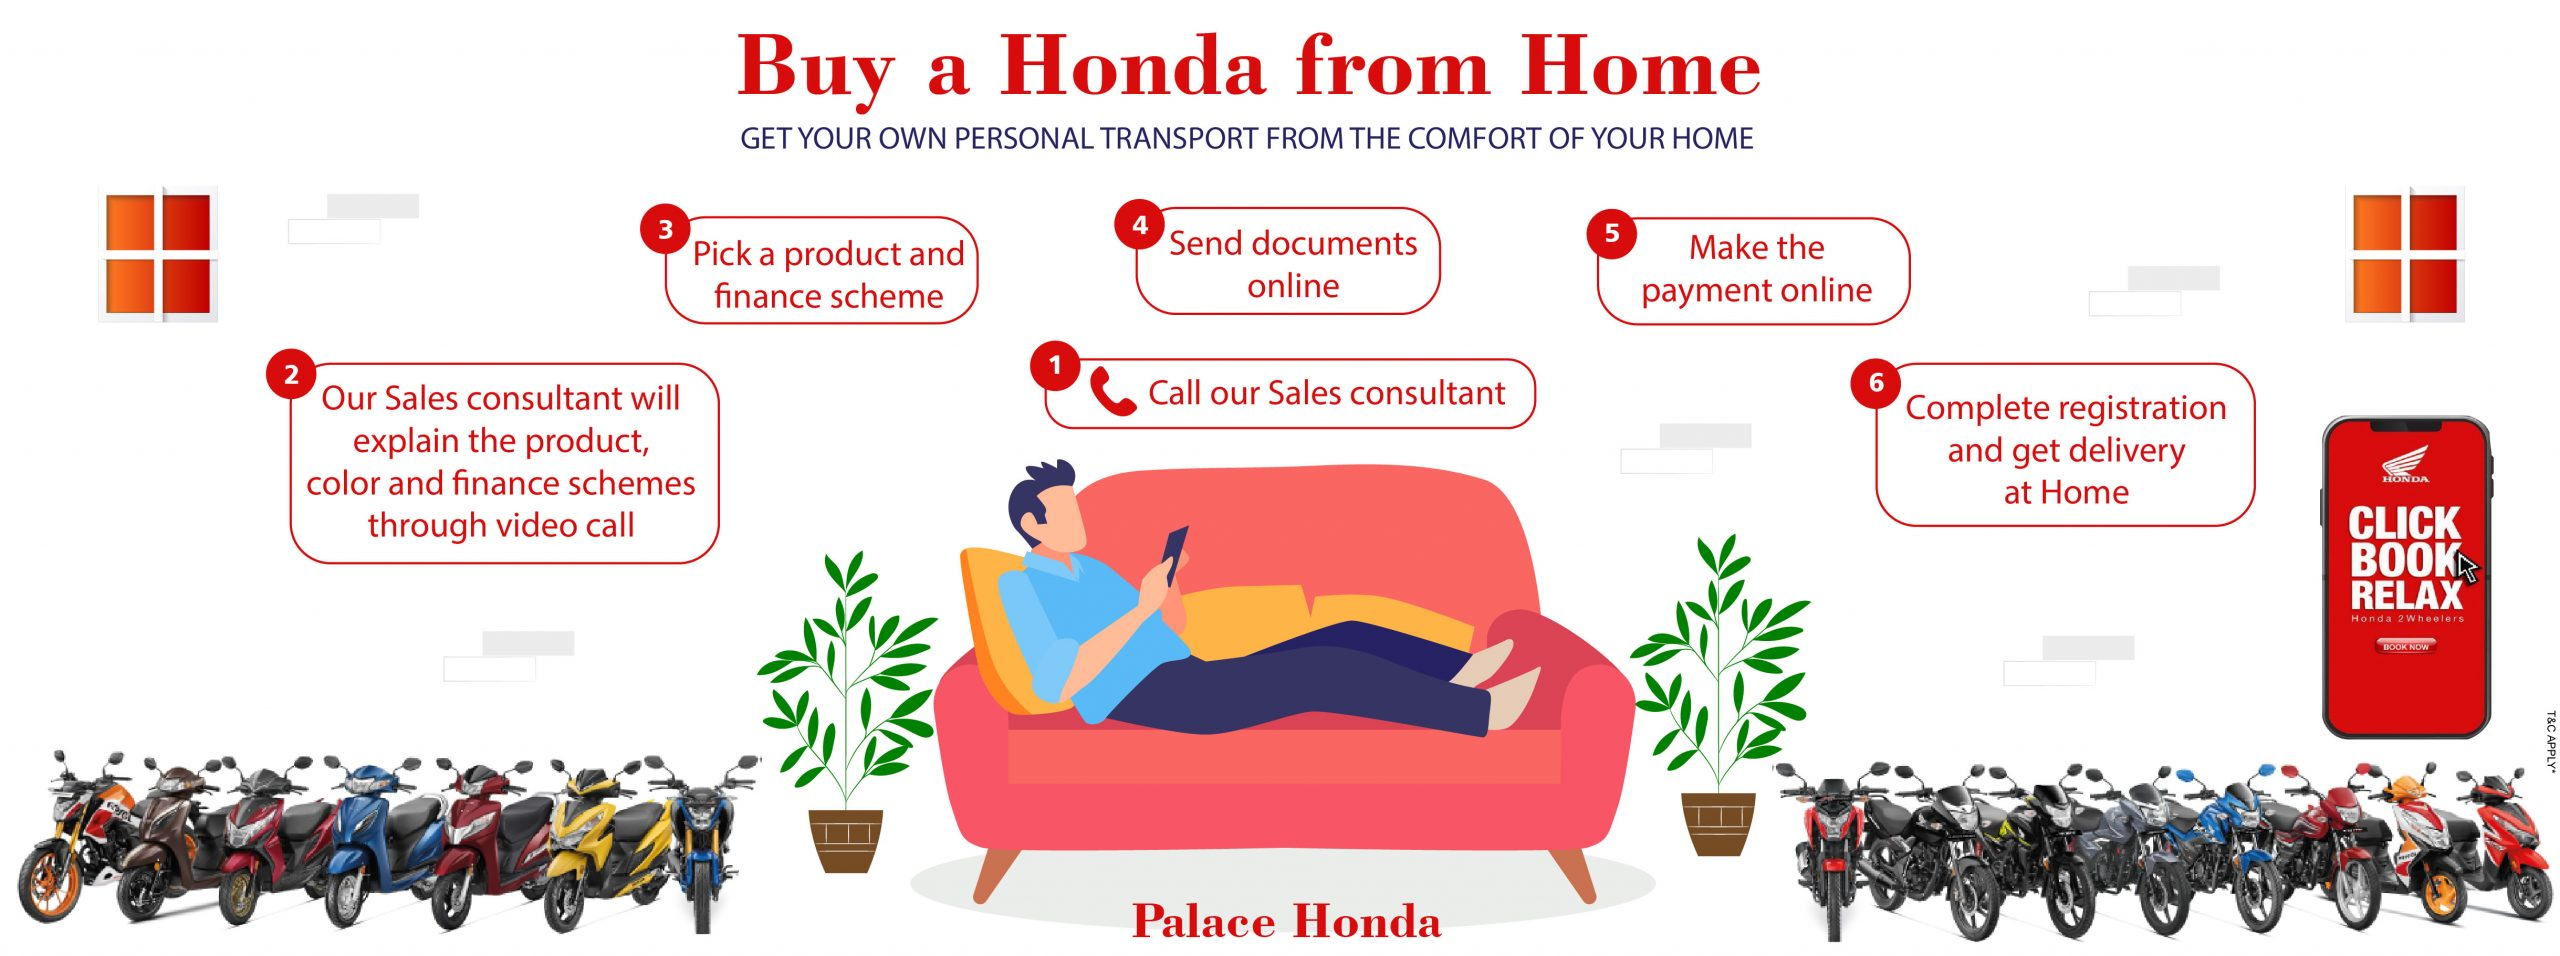 easy_buy_honda